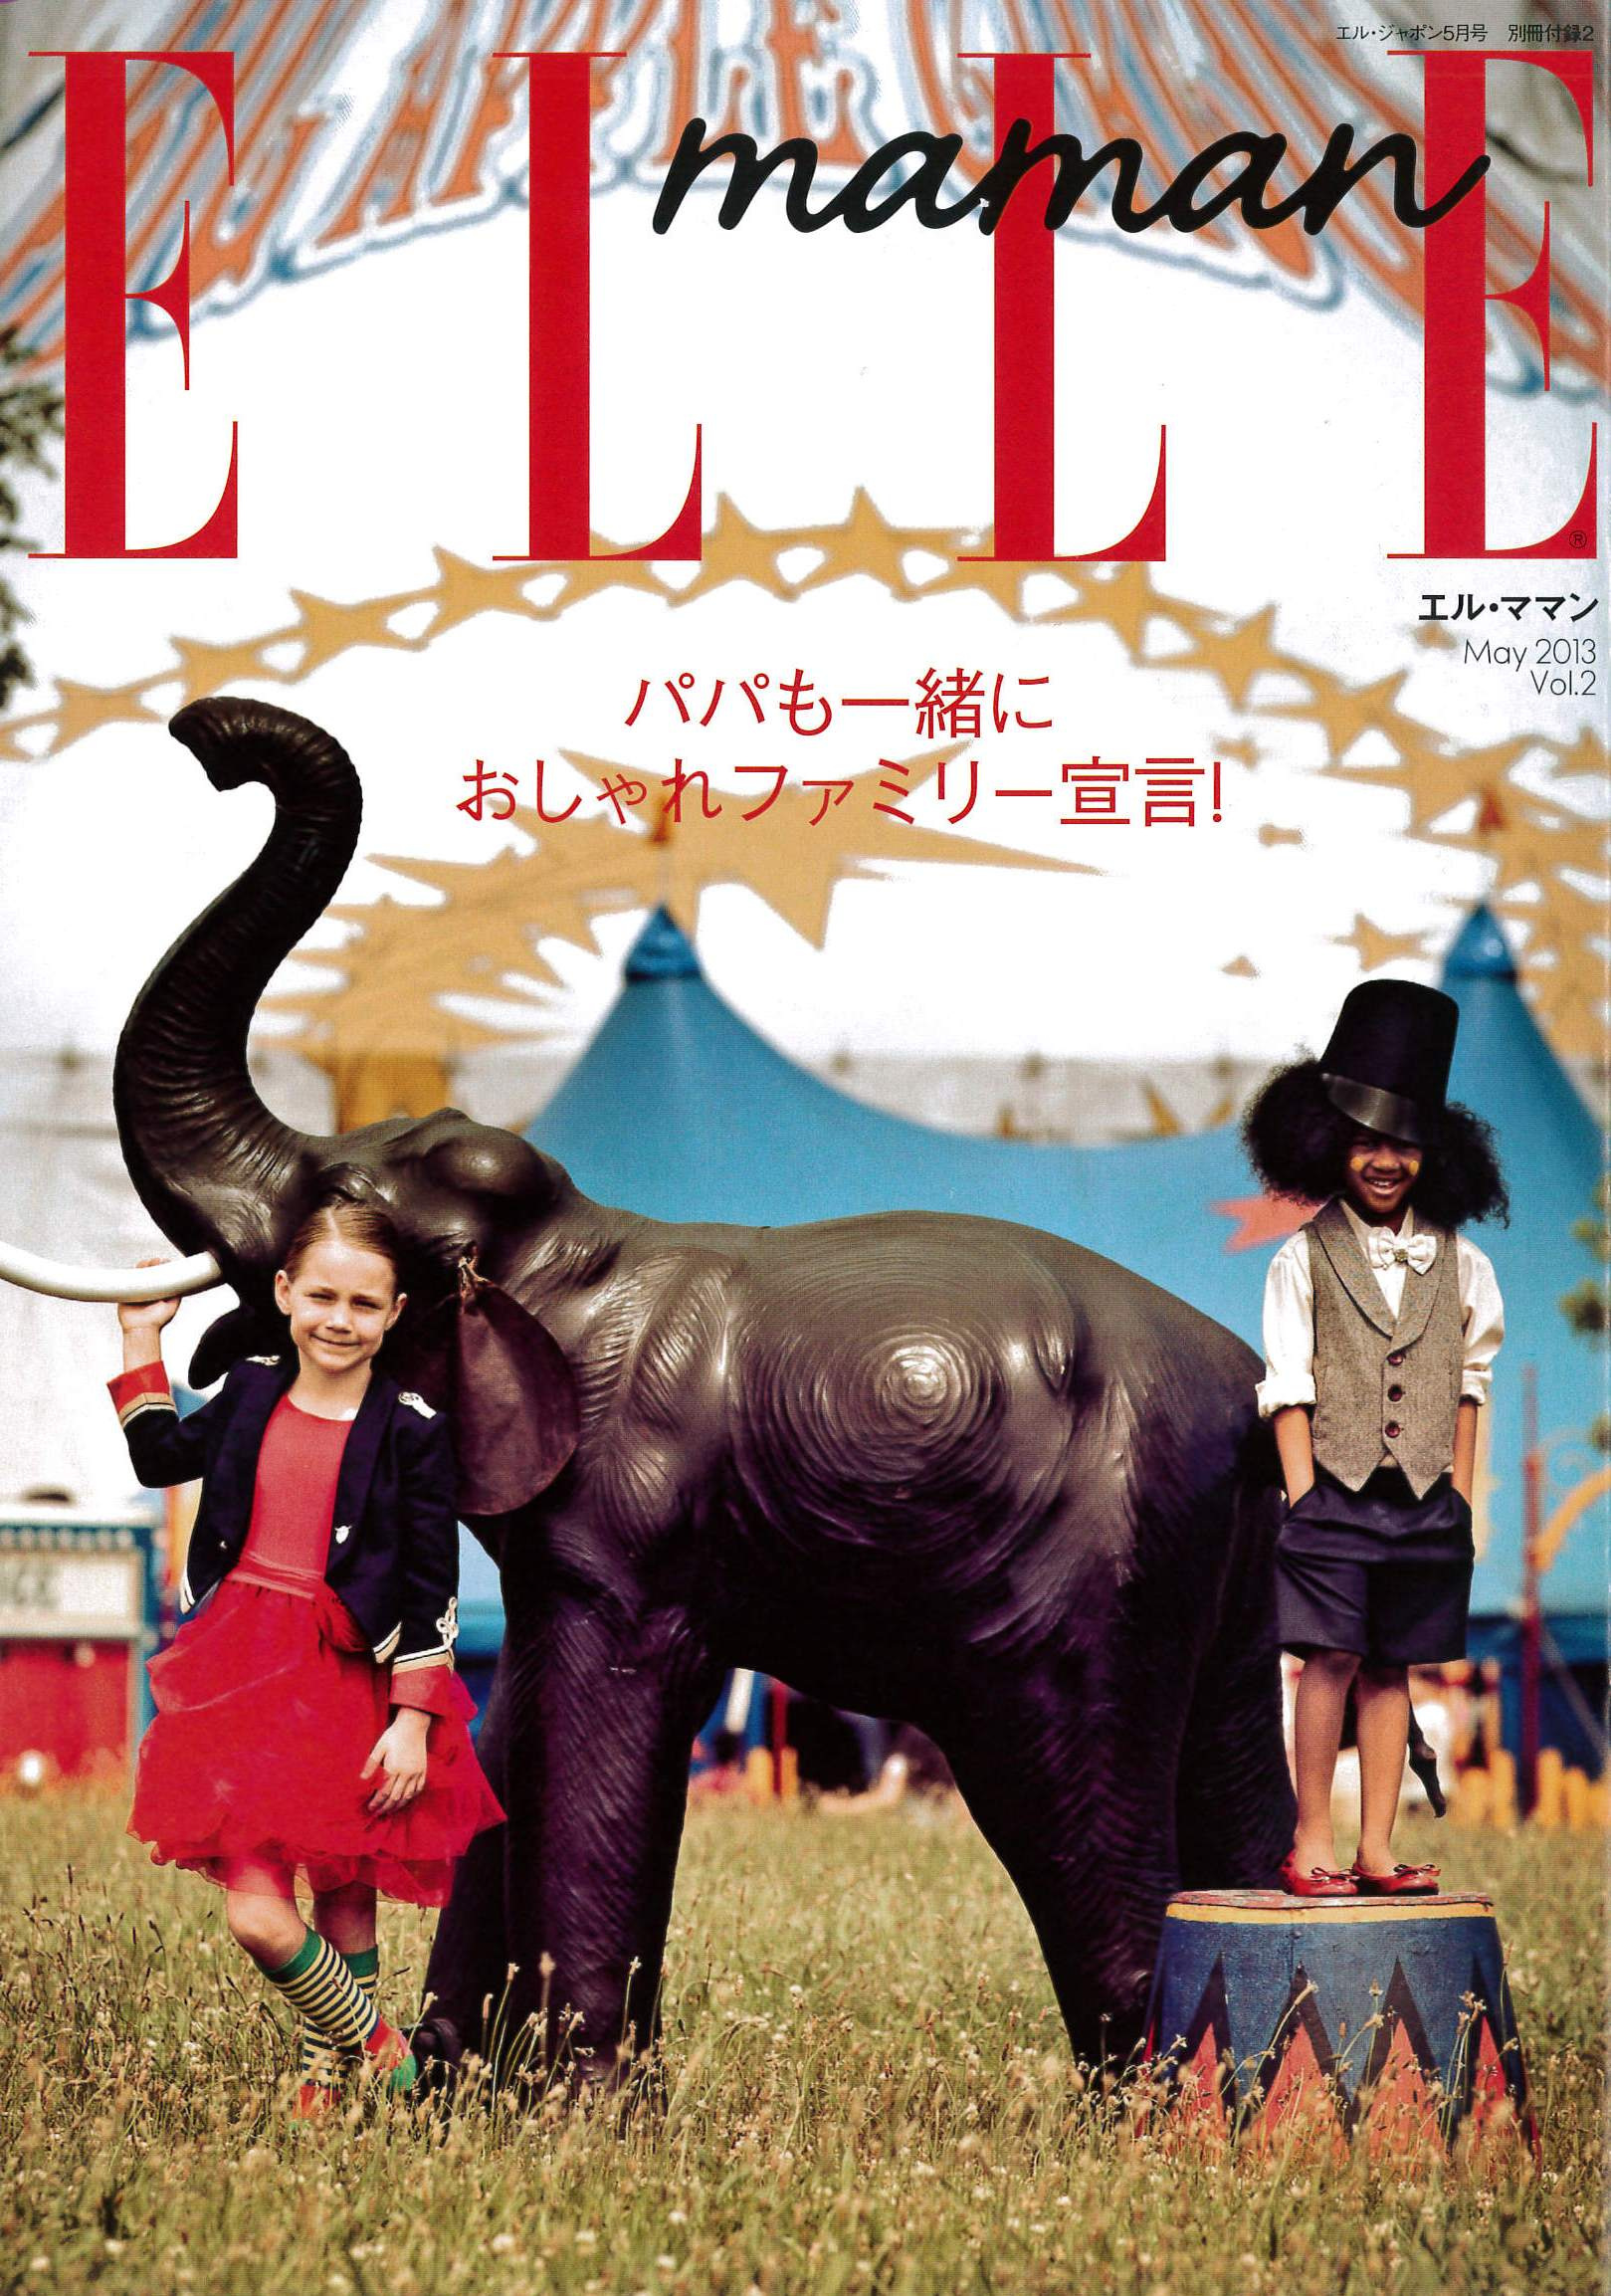 ELLE maman cover.jpg